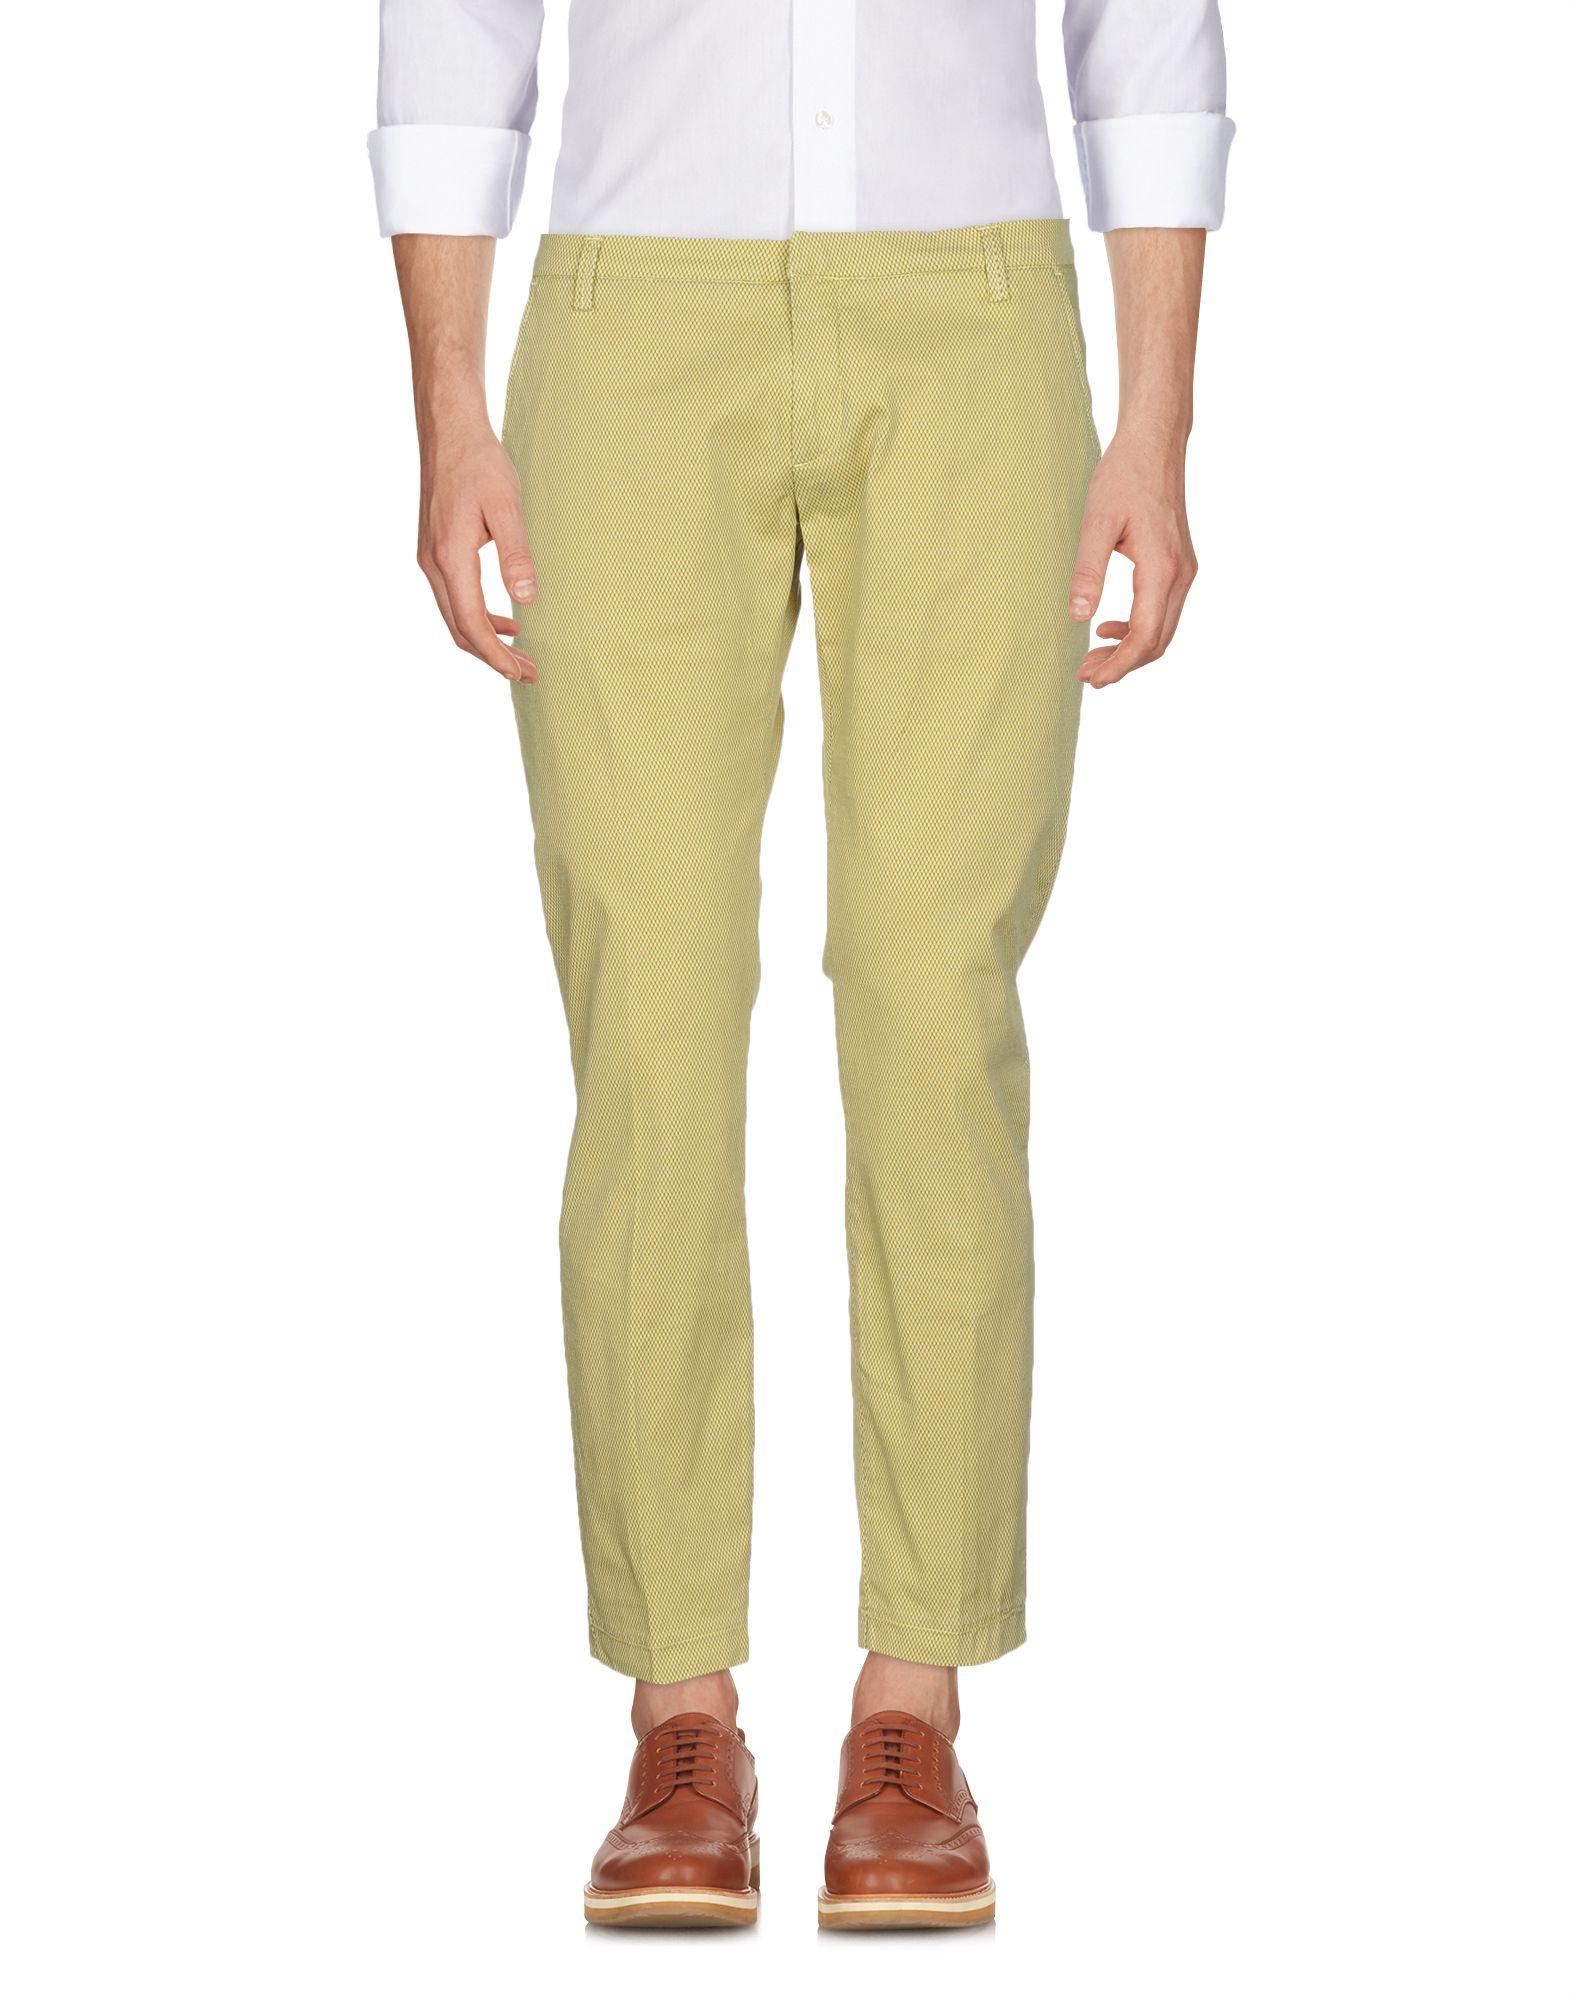 MASSIMO BRUNELLI Повседневные брюки 19 70 genuine wear повседневные брюки